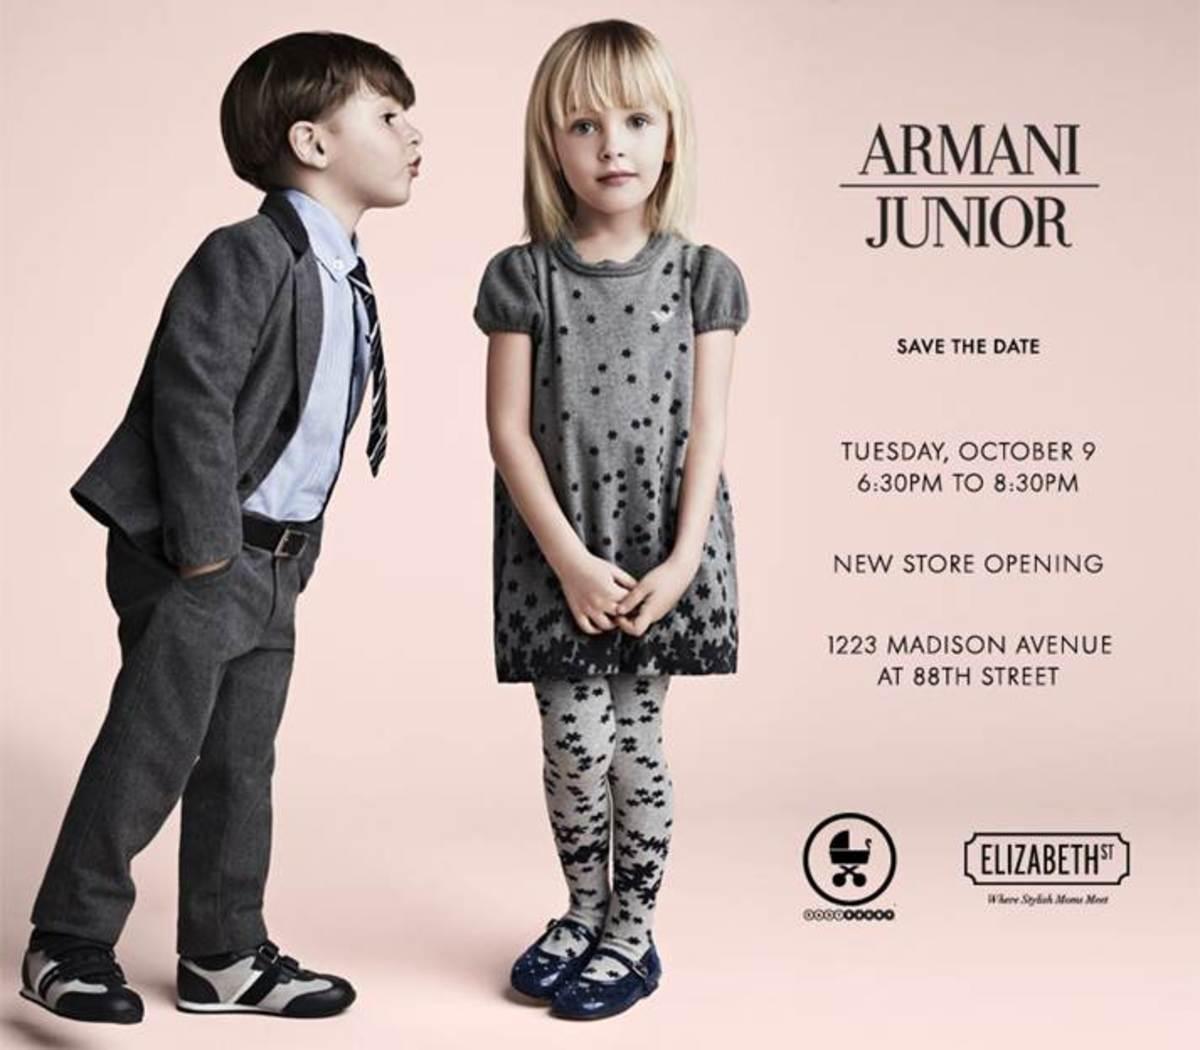 Armani Junior Invite